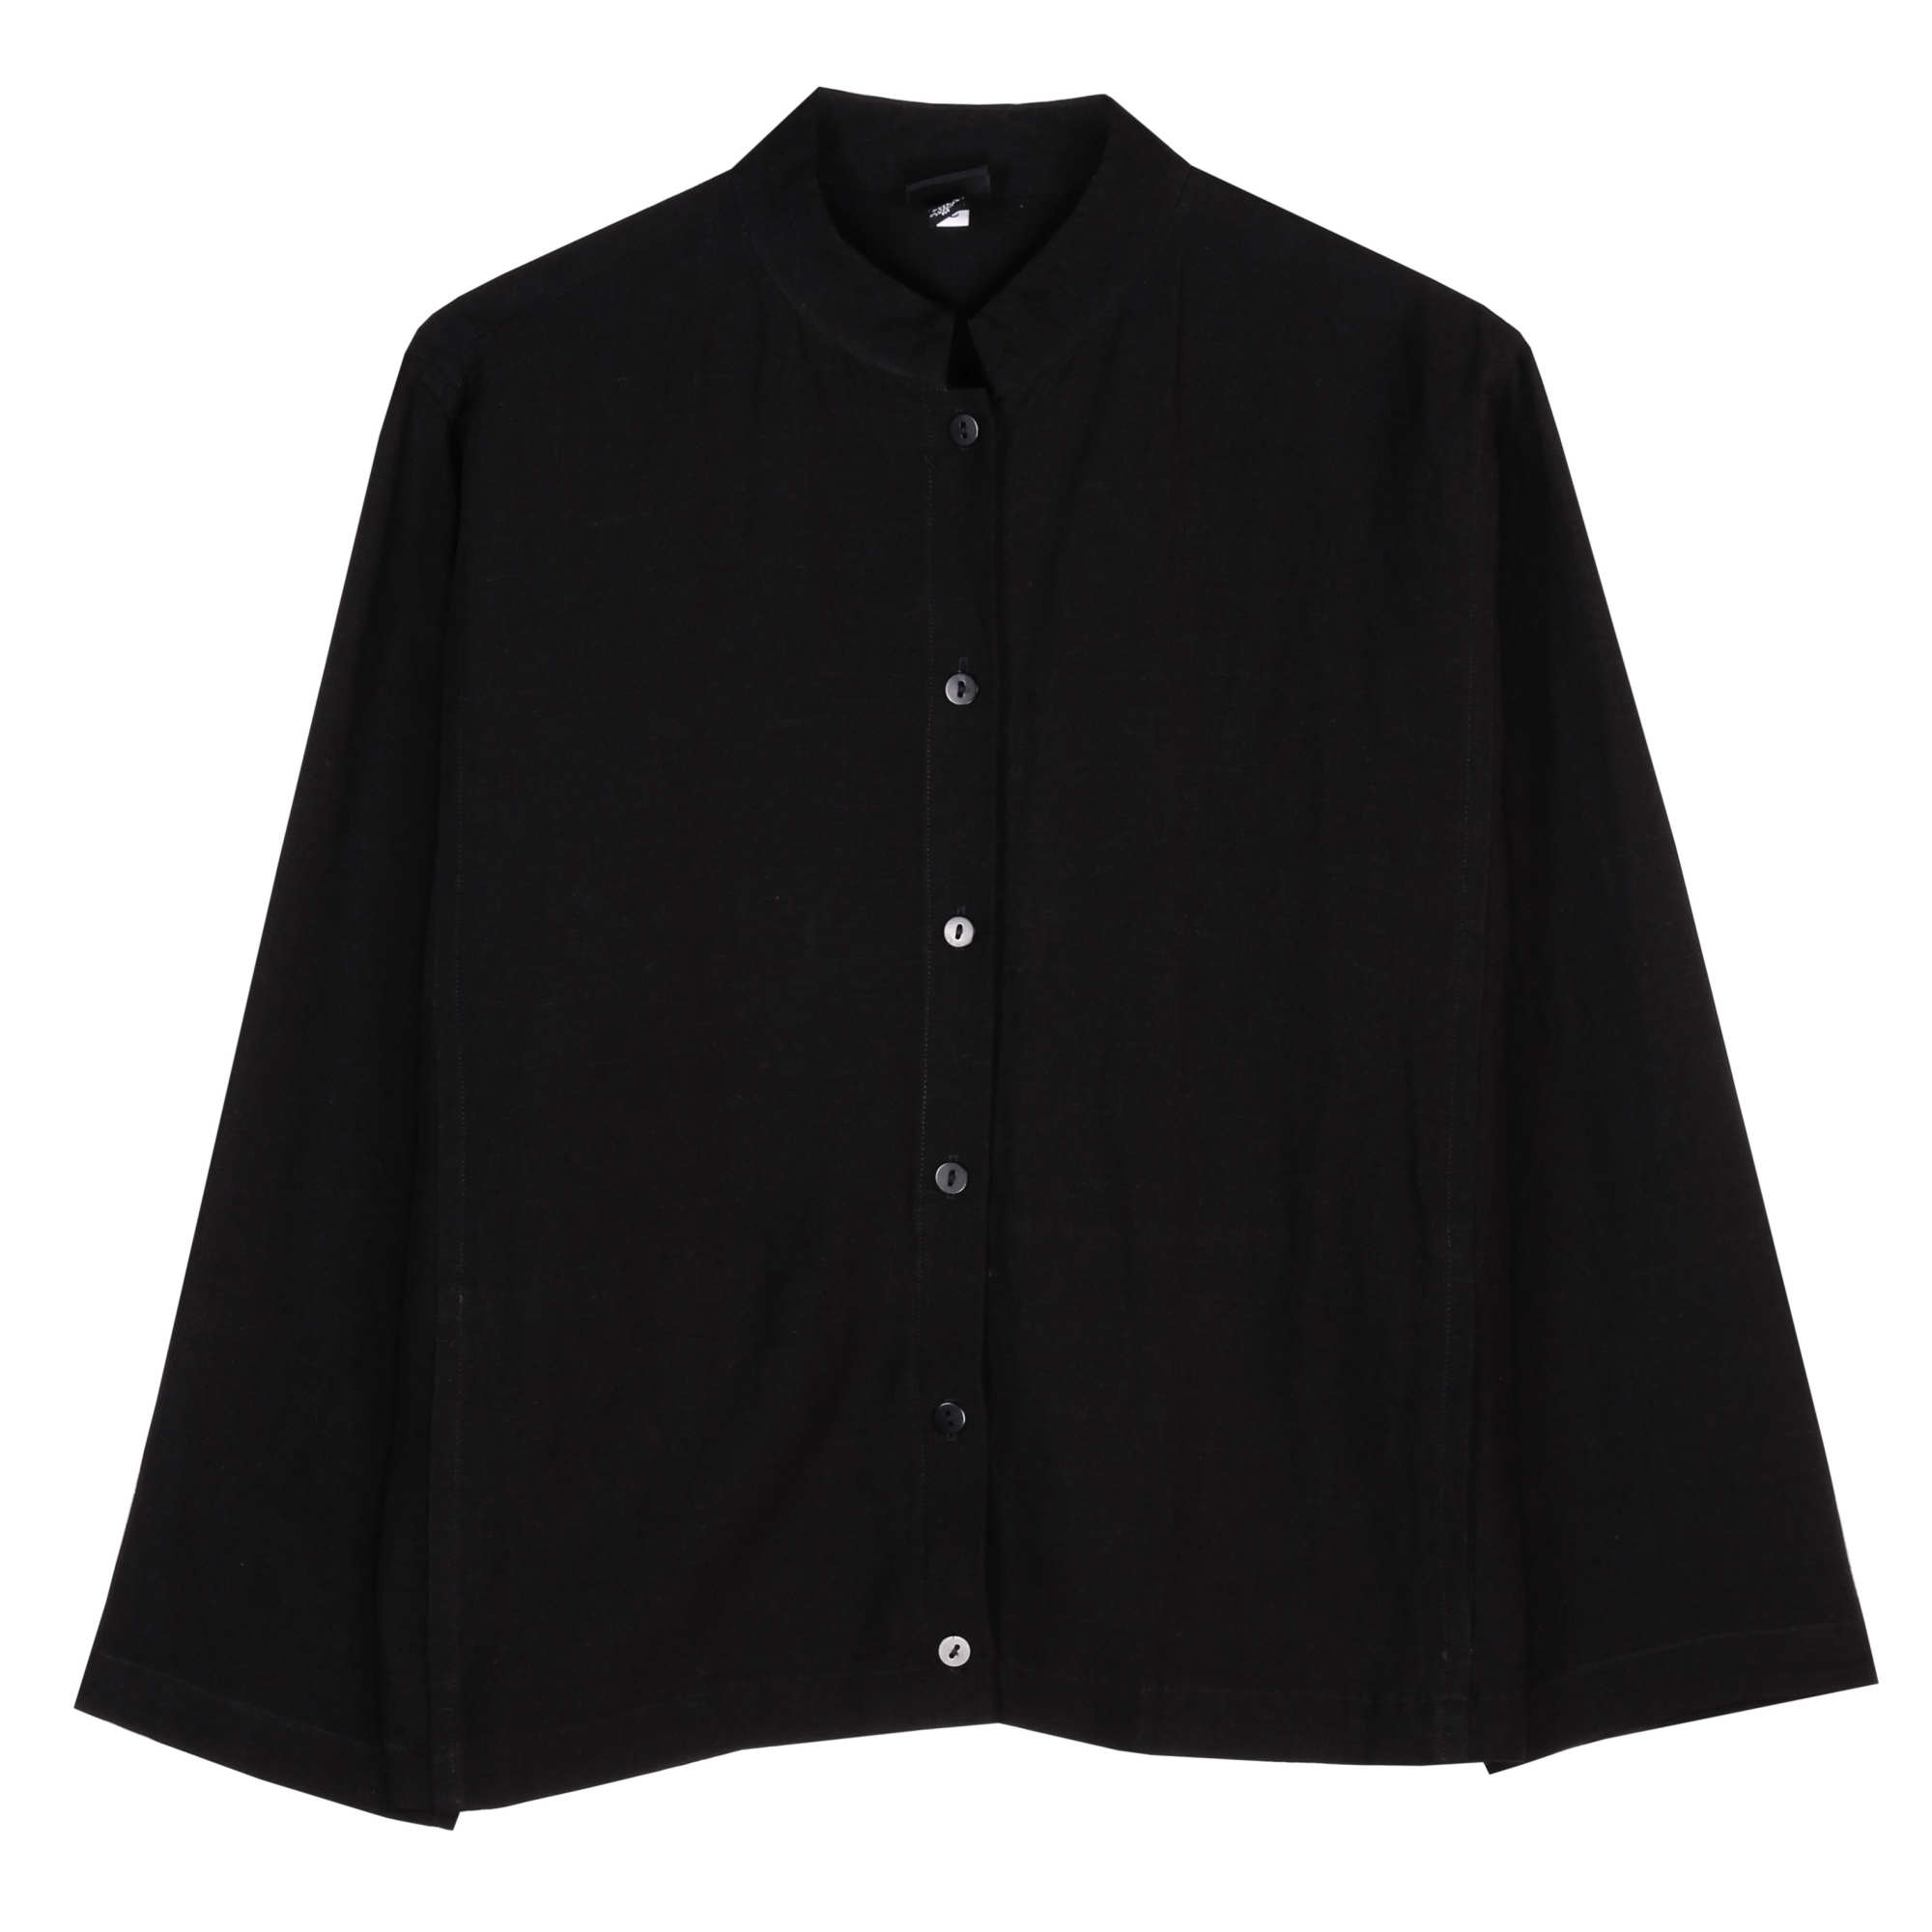 Viscose Linen Jacket